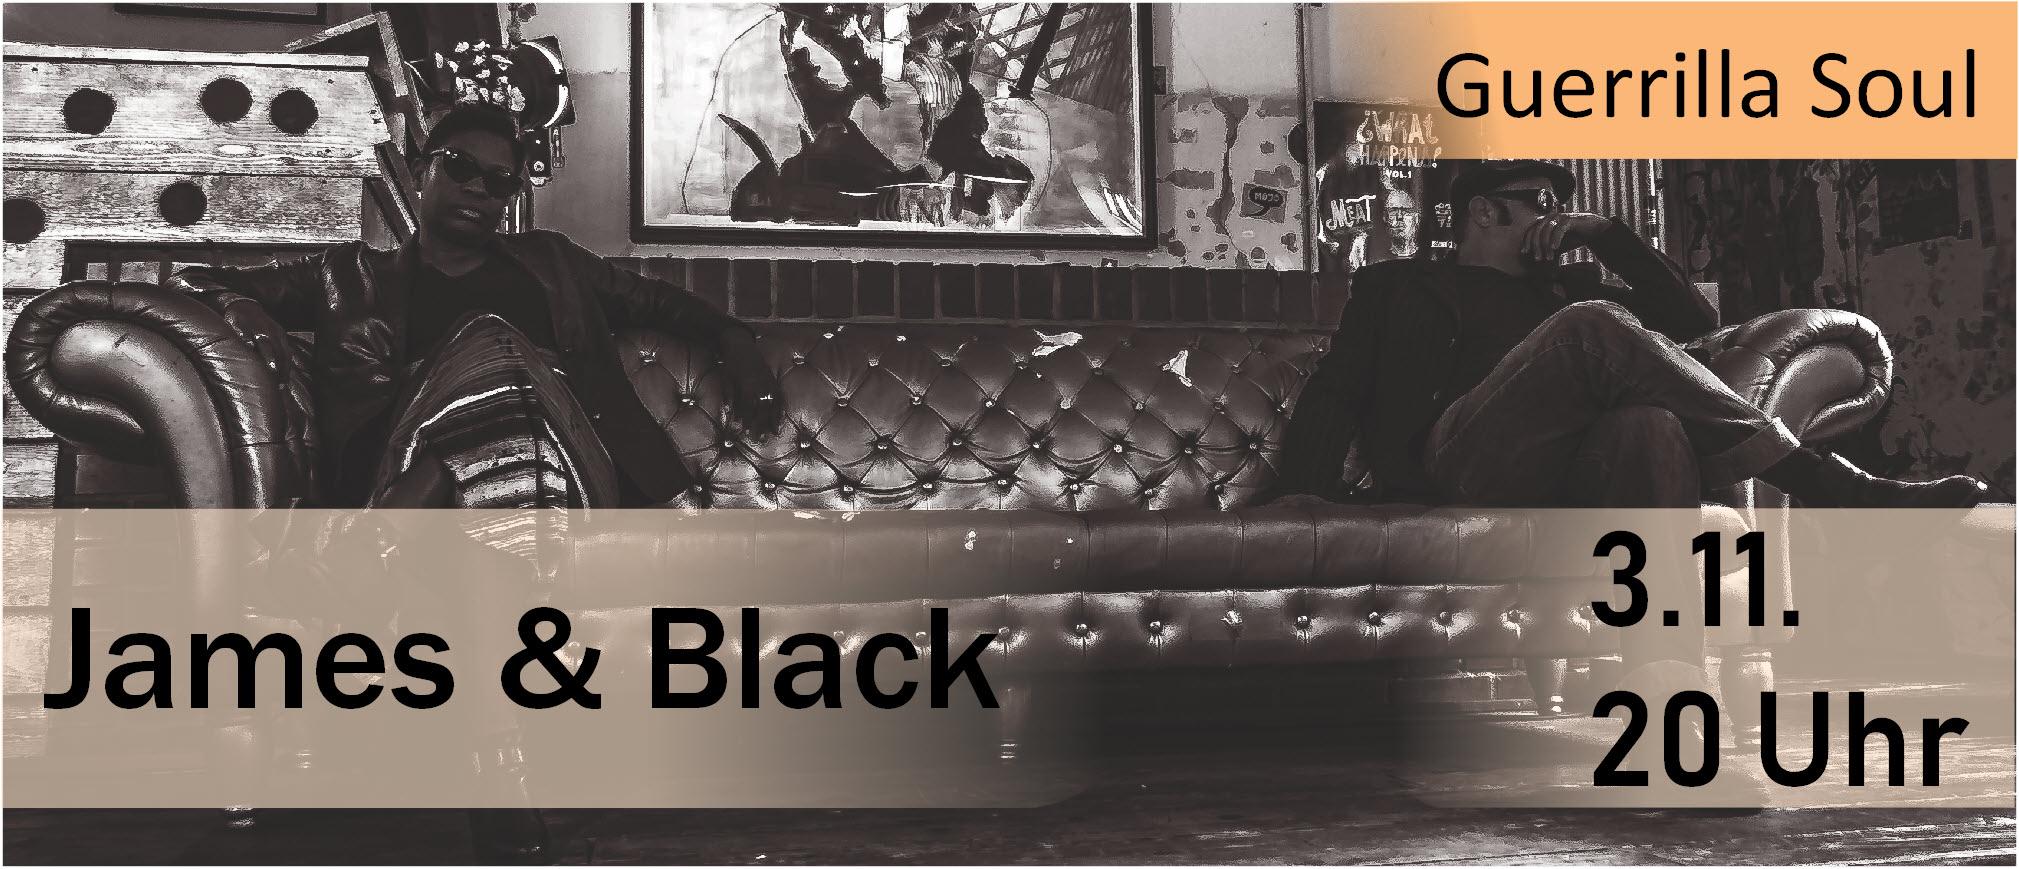 James & Black im Parkclub